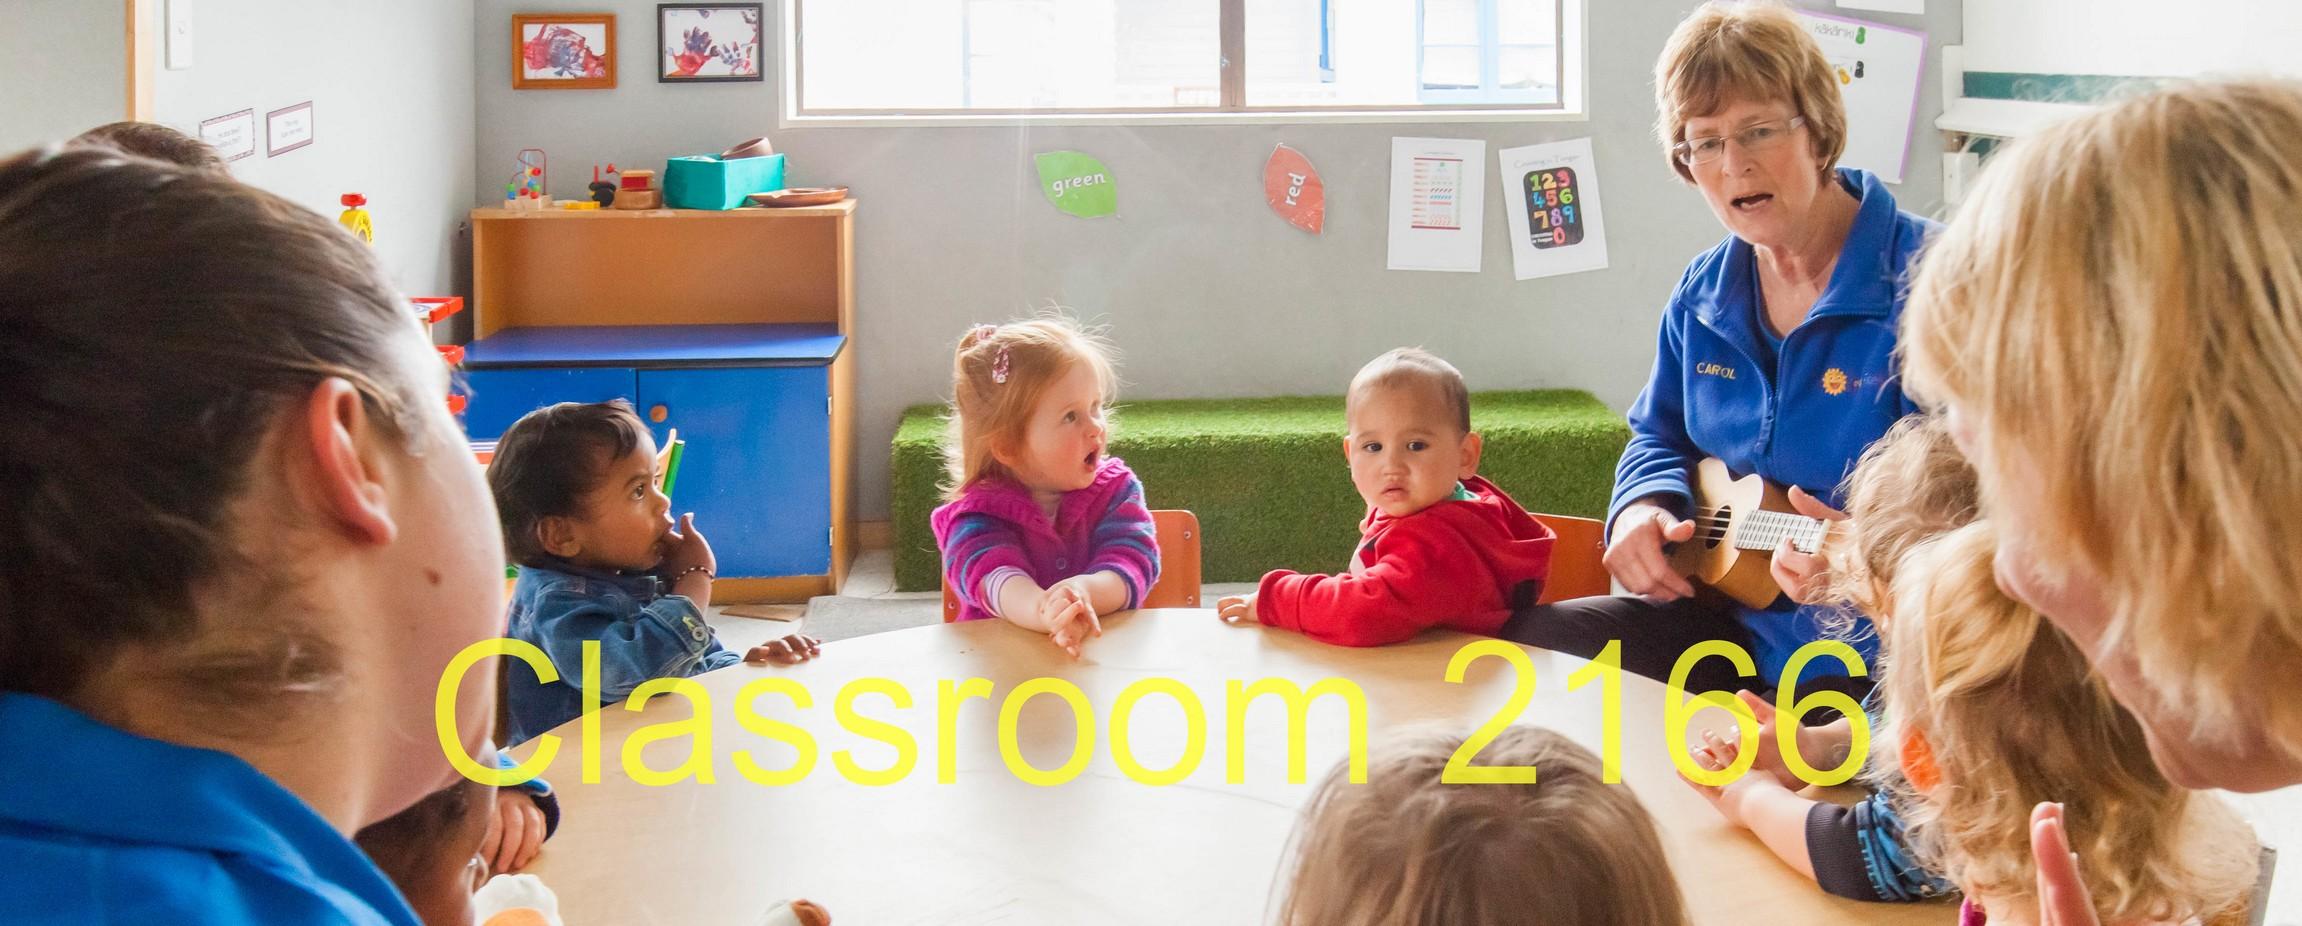 Classroom 2166